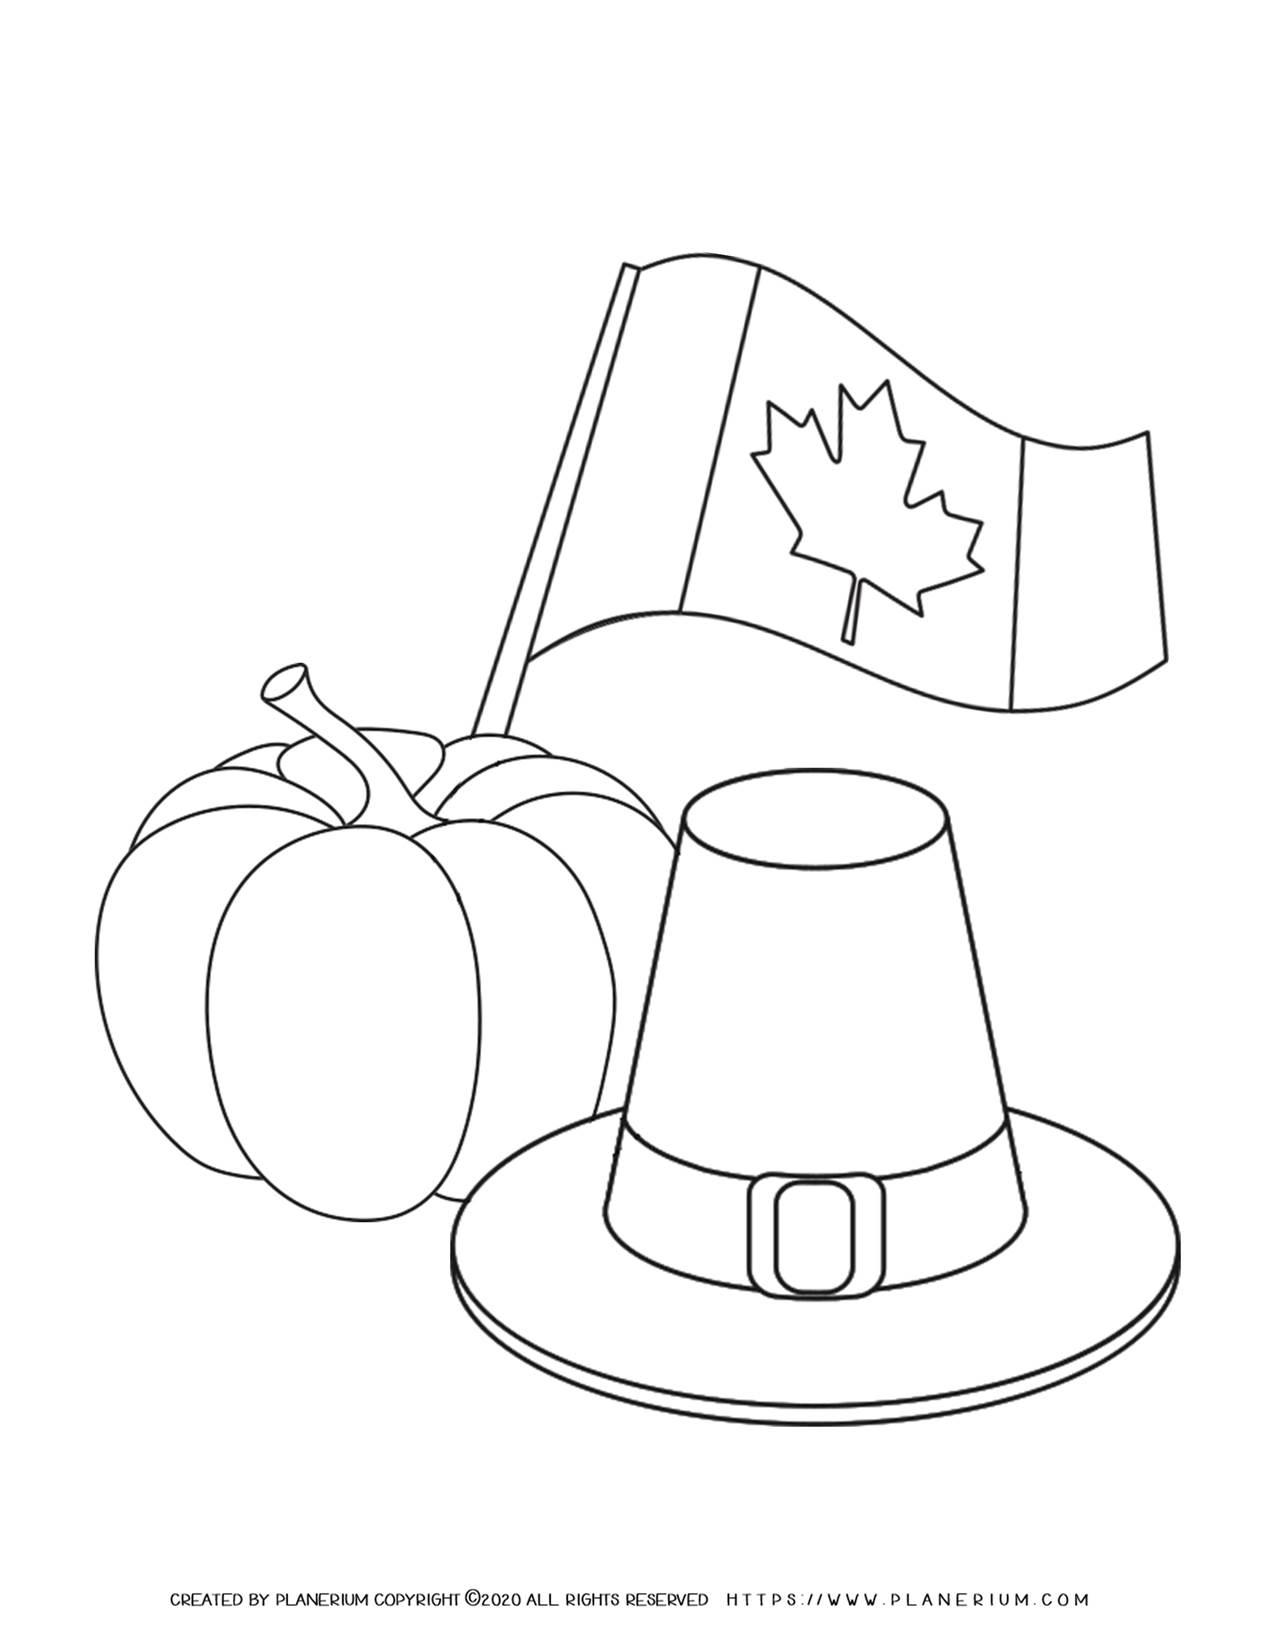 Thanksgiving Symbols - Coloring Page | Planerium